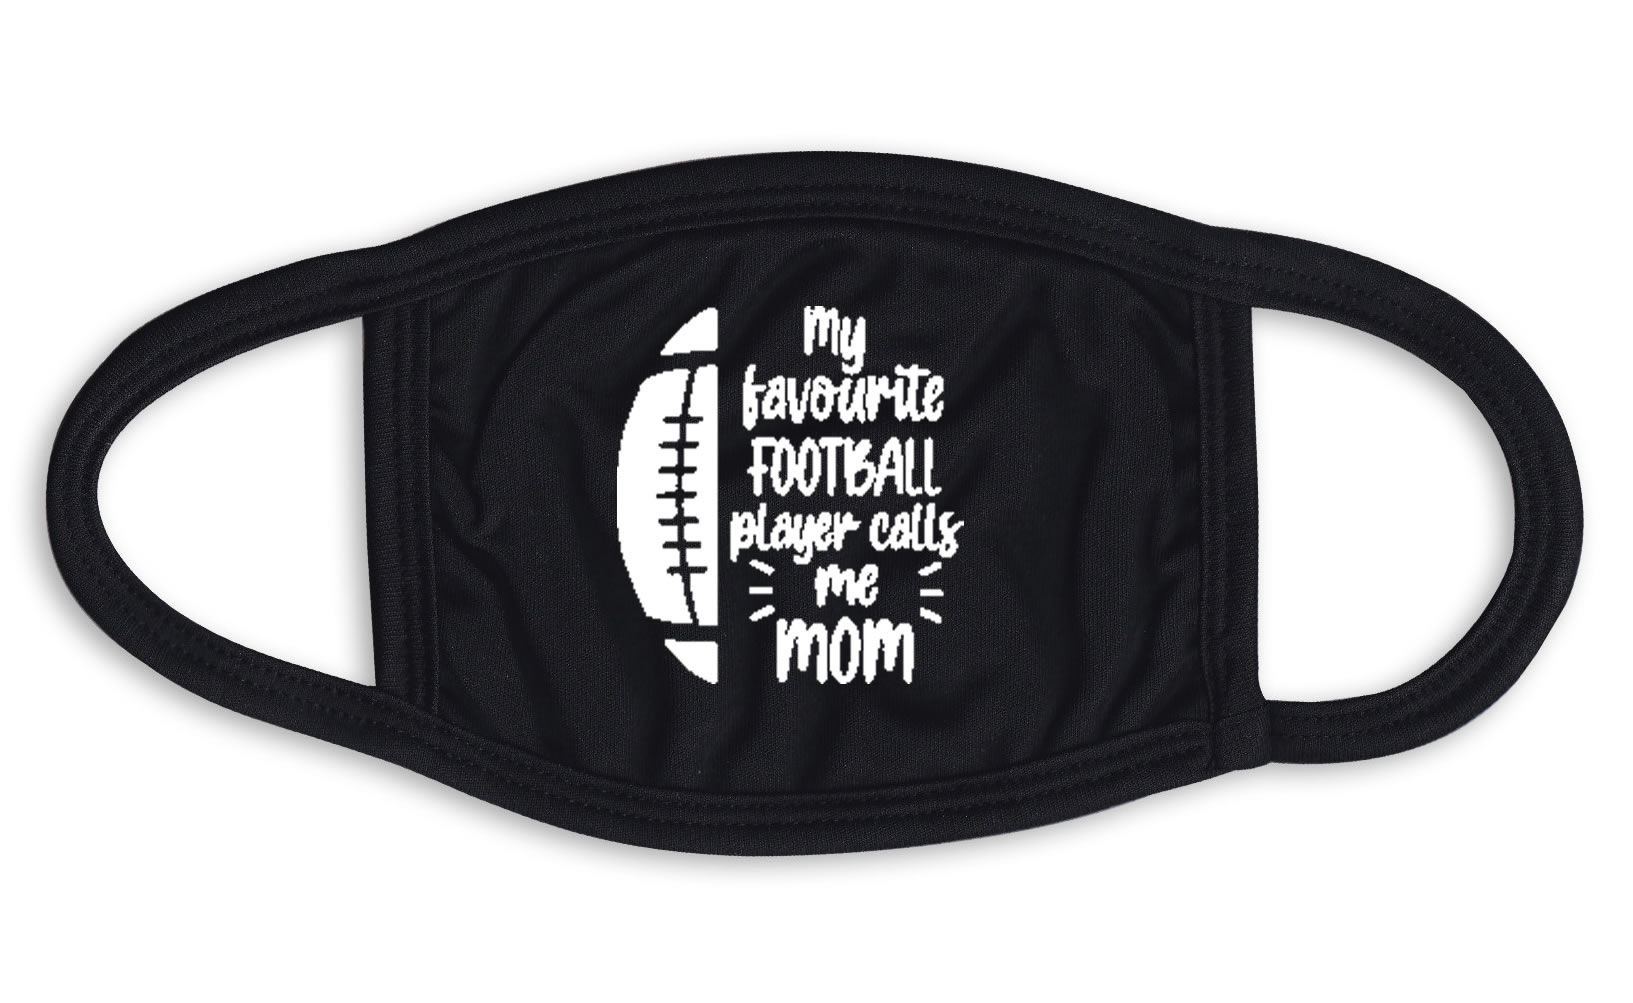 My Favorite Football Player Calls Me Mom